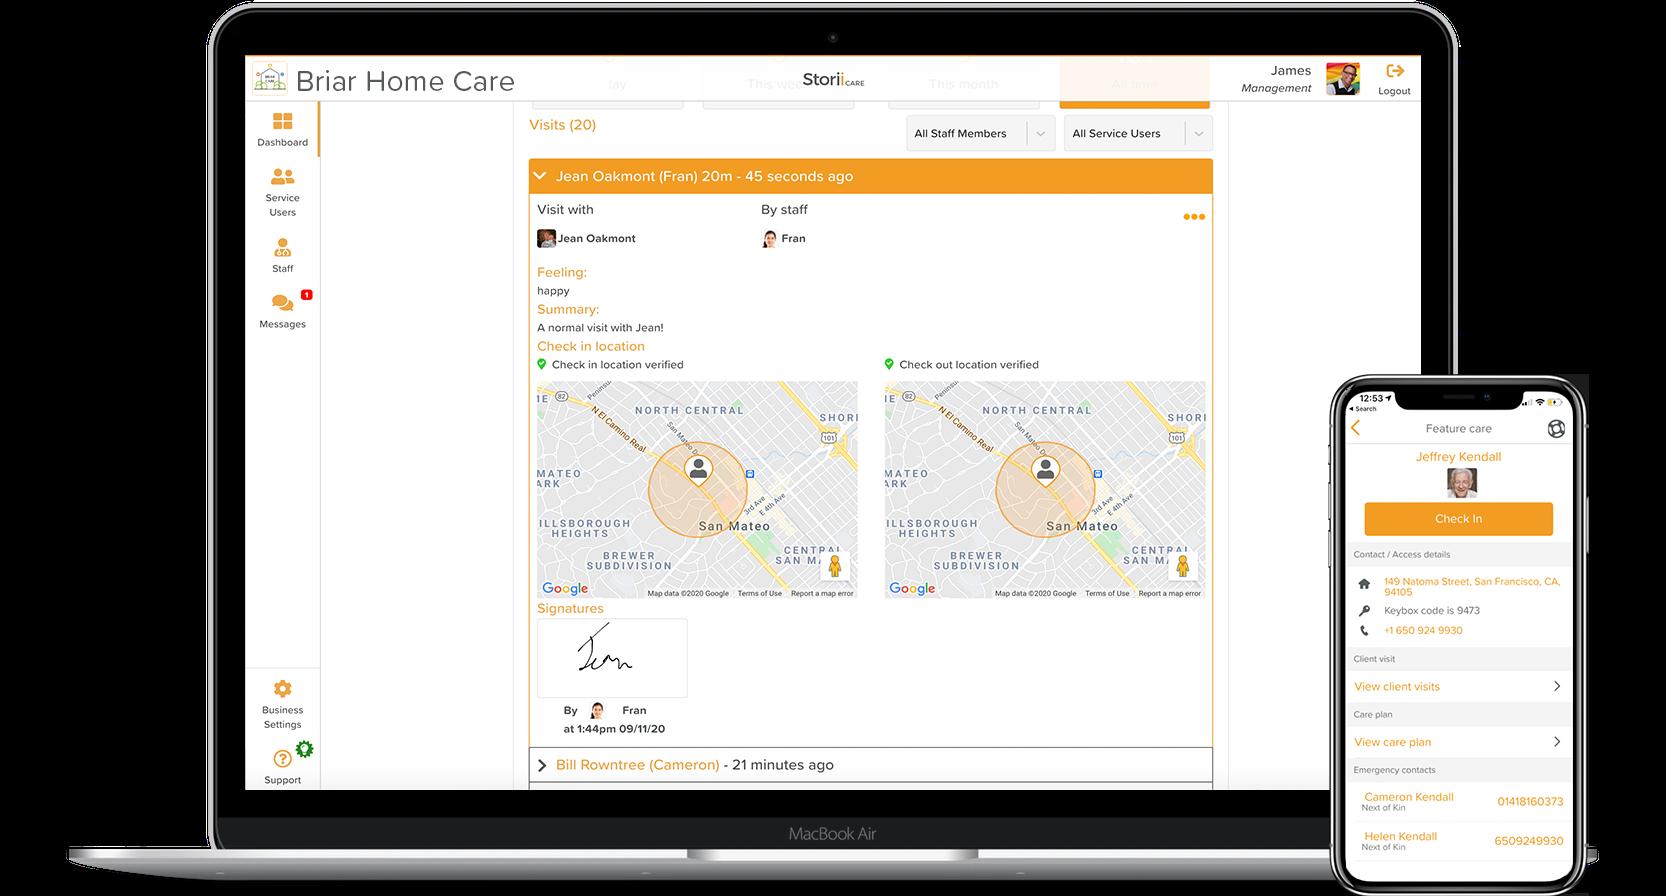 Home Care Electronic Visit Verification